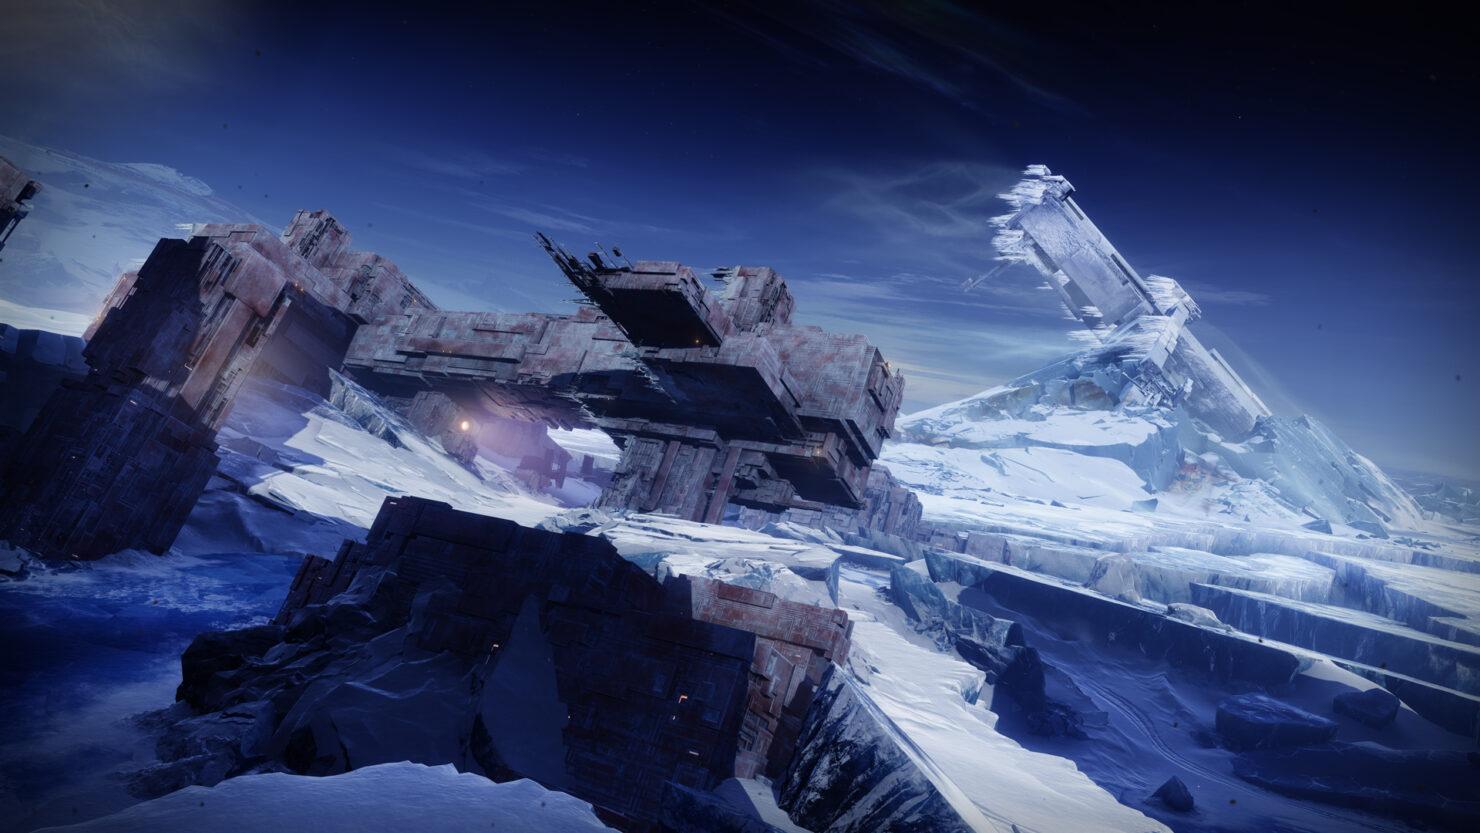 destiny-2-beyond-light-europa-environment-02